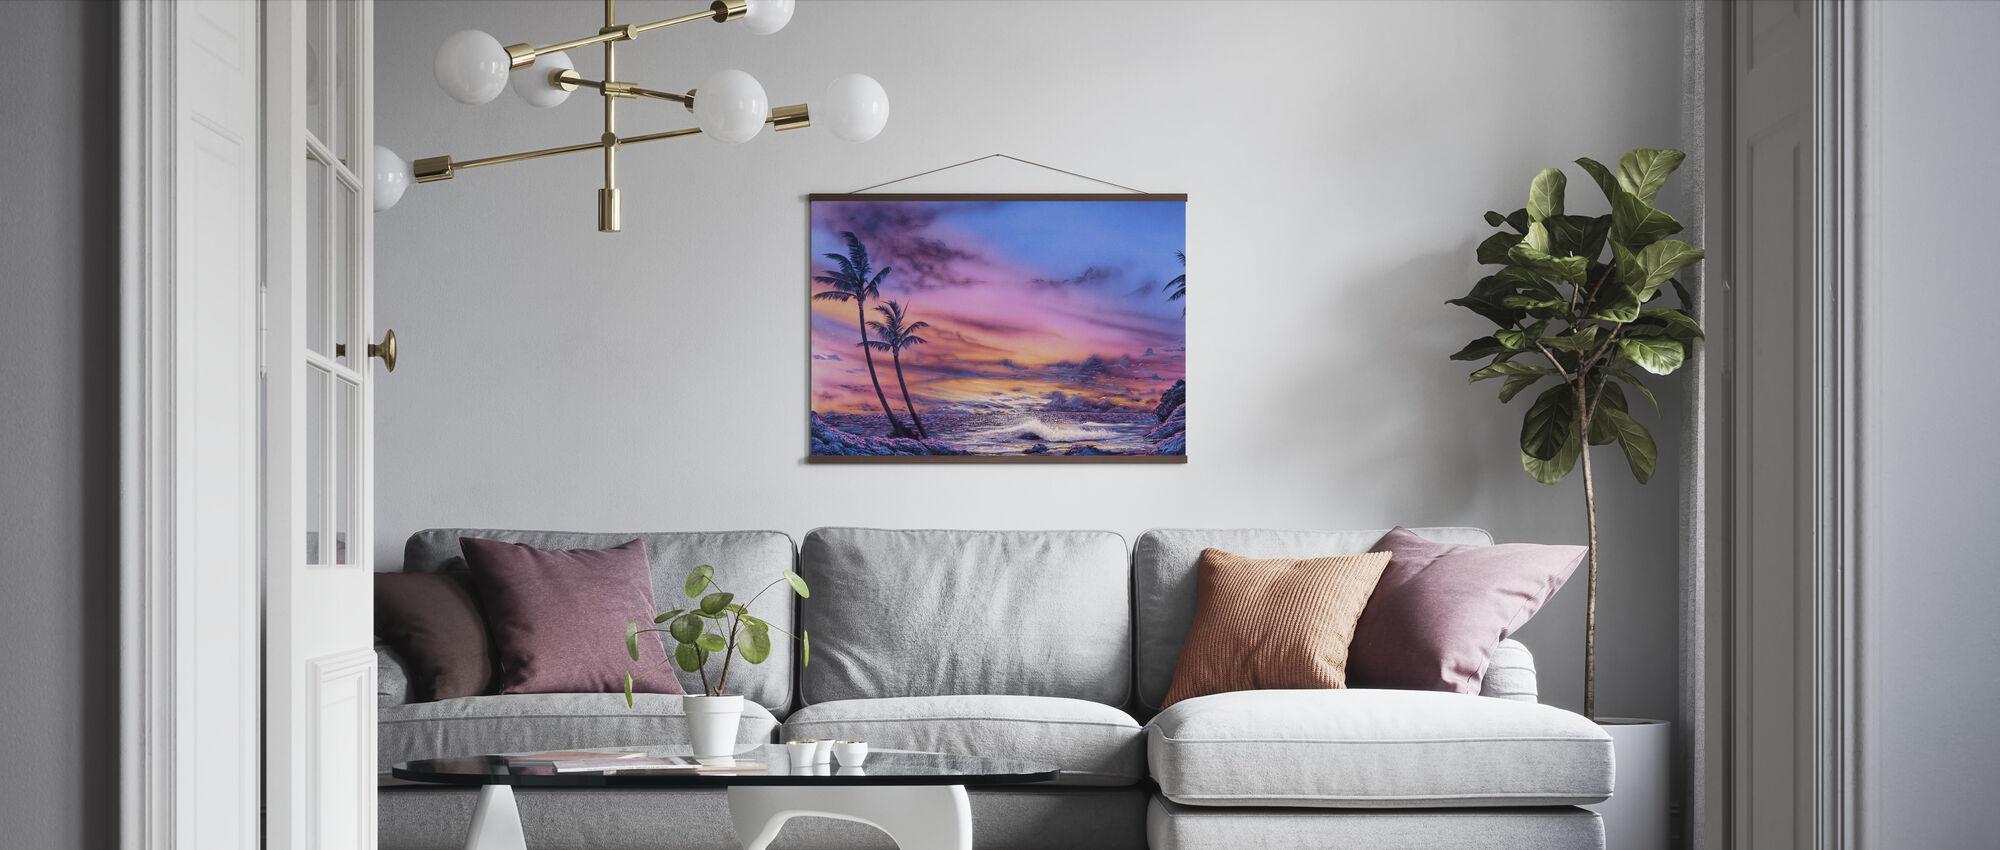 Venus Sunset - Poster - Living Room